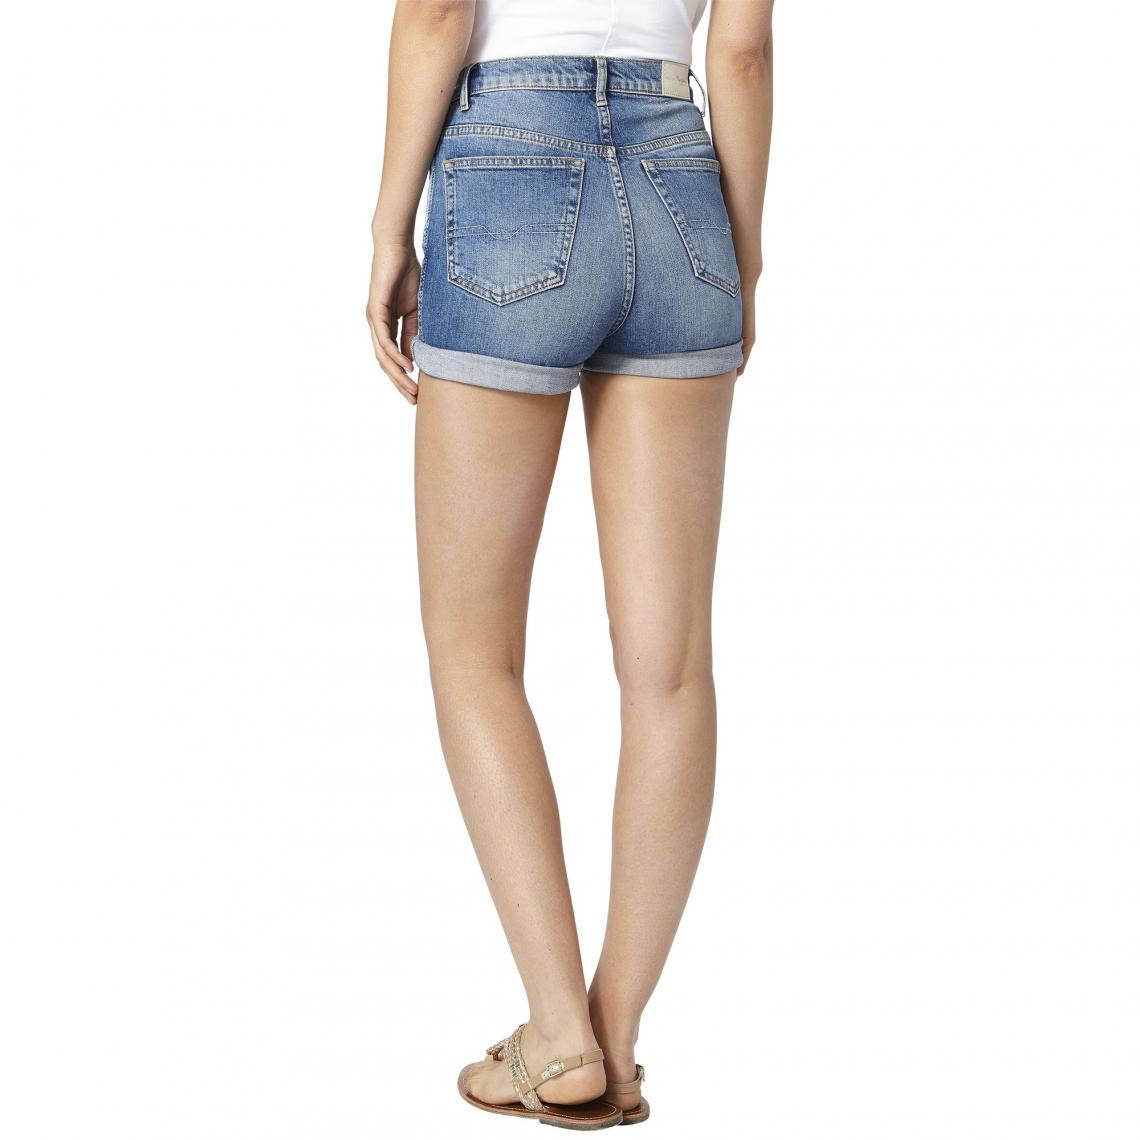 1d23111a070 Short en jean slim femme Pepe Jeans - Bleu